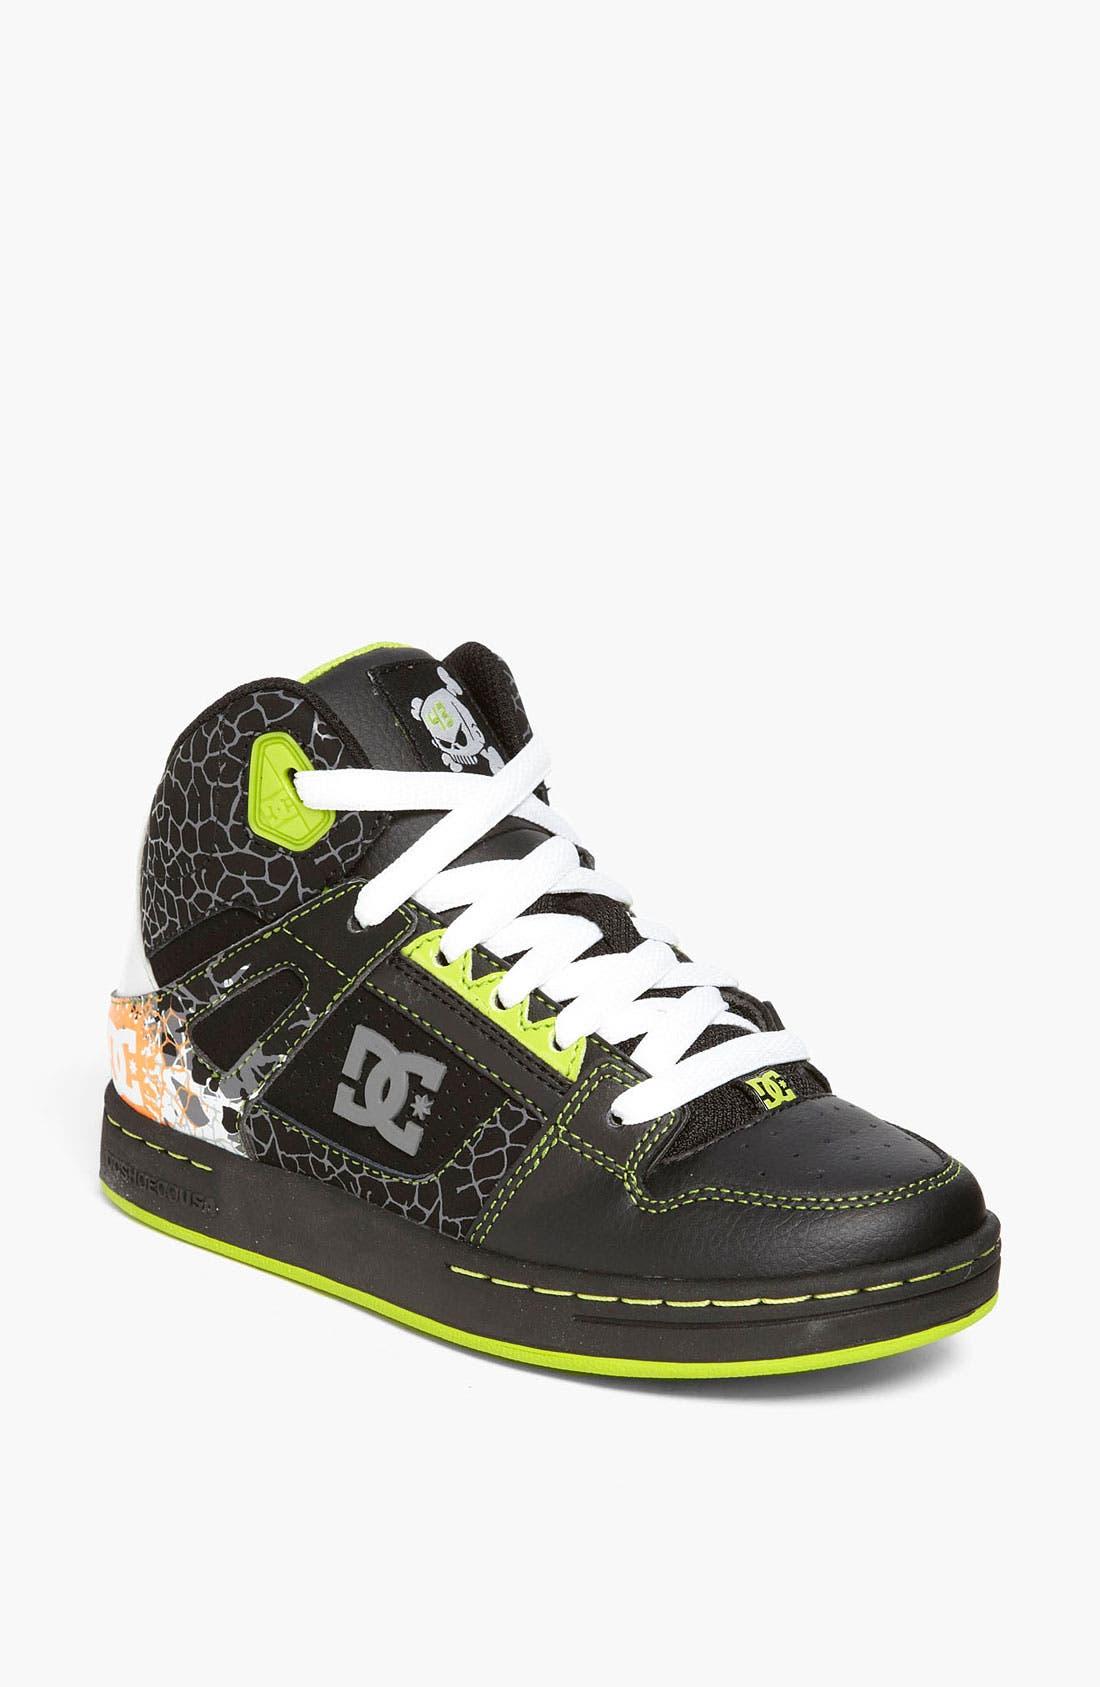 Main Image - DC Shoes 'Rebound' Sneaker (Toddler, Little Kid & Big Kid)